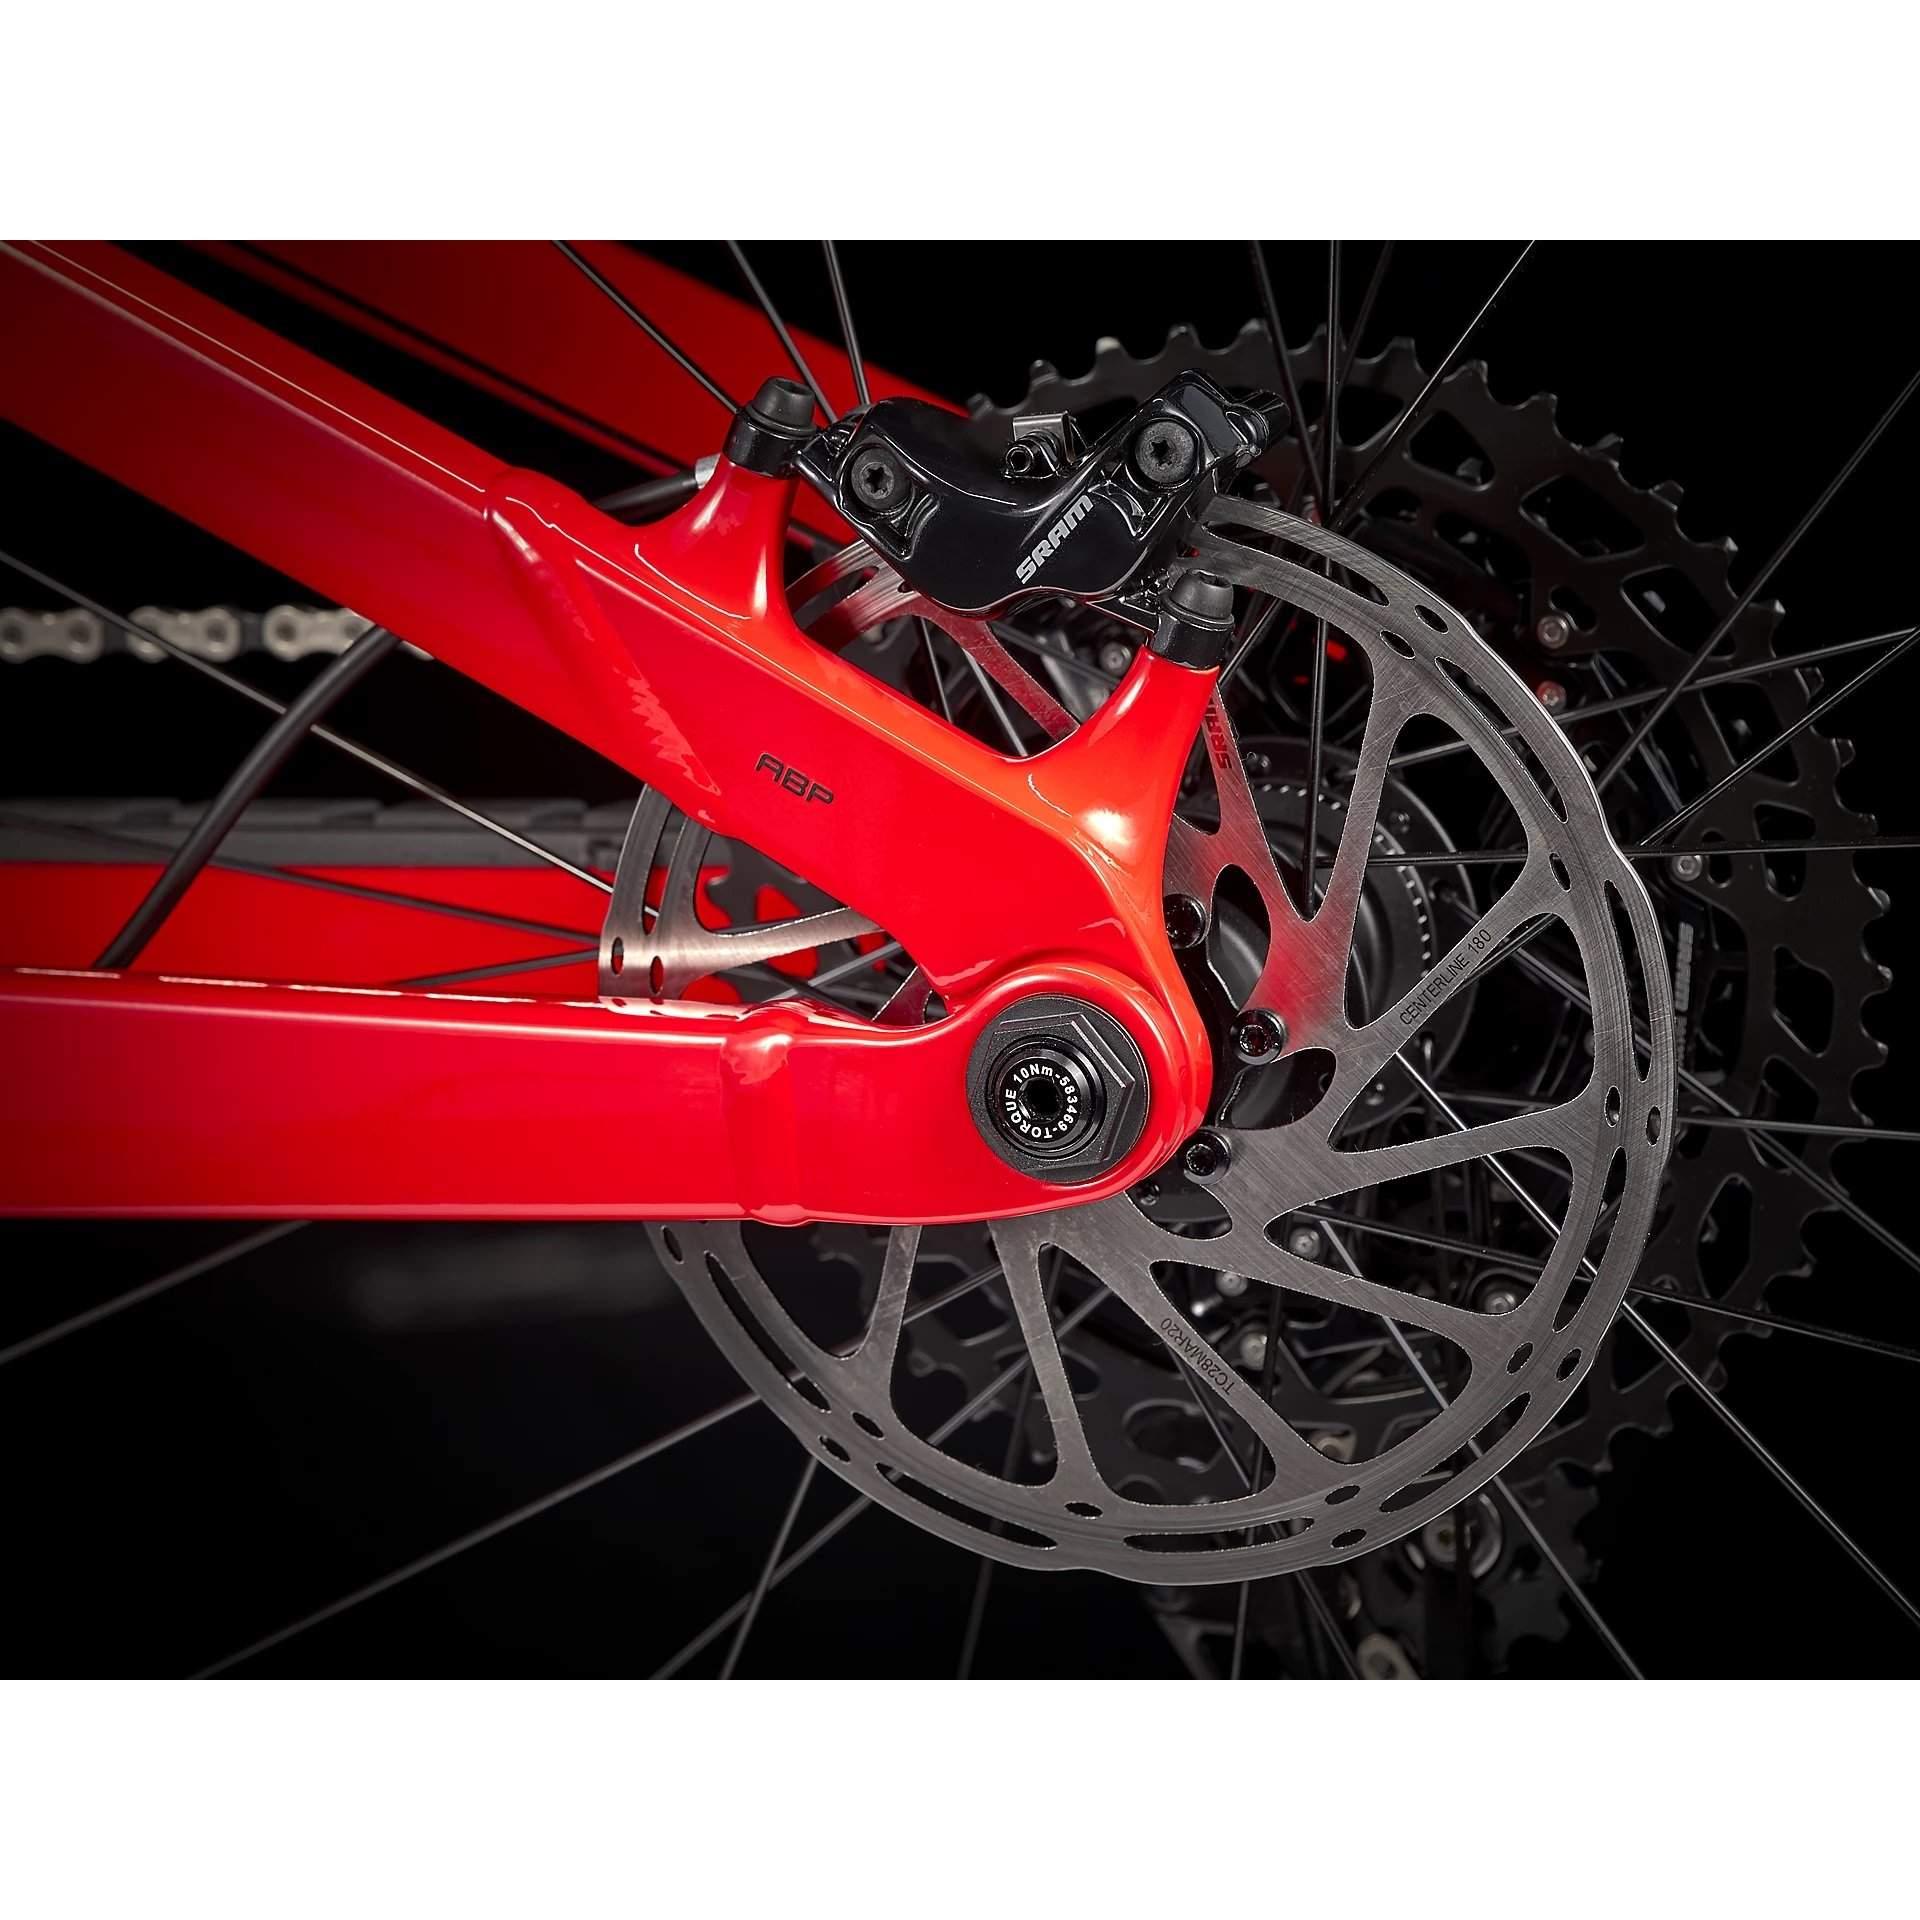 ROWER TREK SLASH 7 GLOSS RADIOACTIVE RED|MATTE BLACK 91